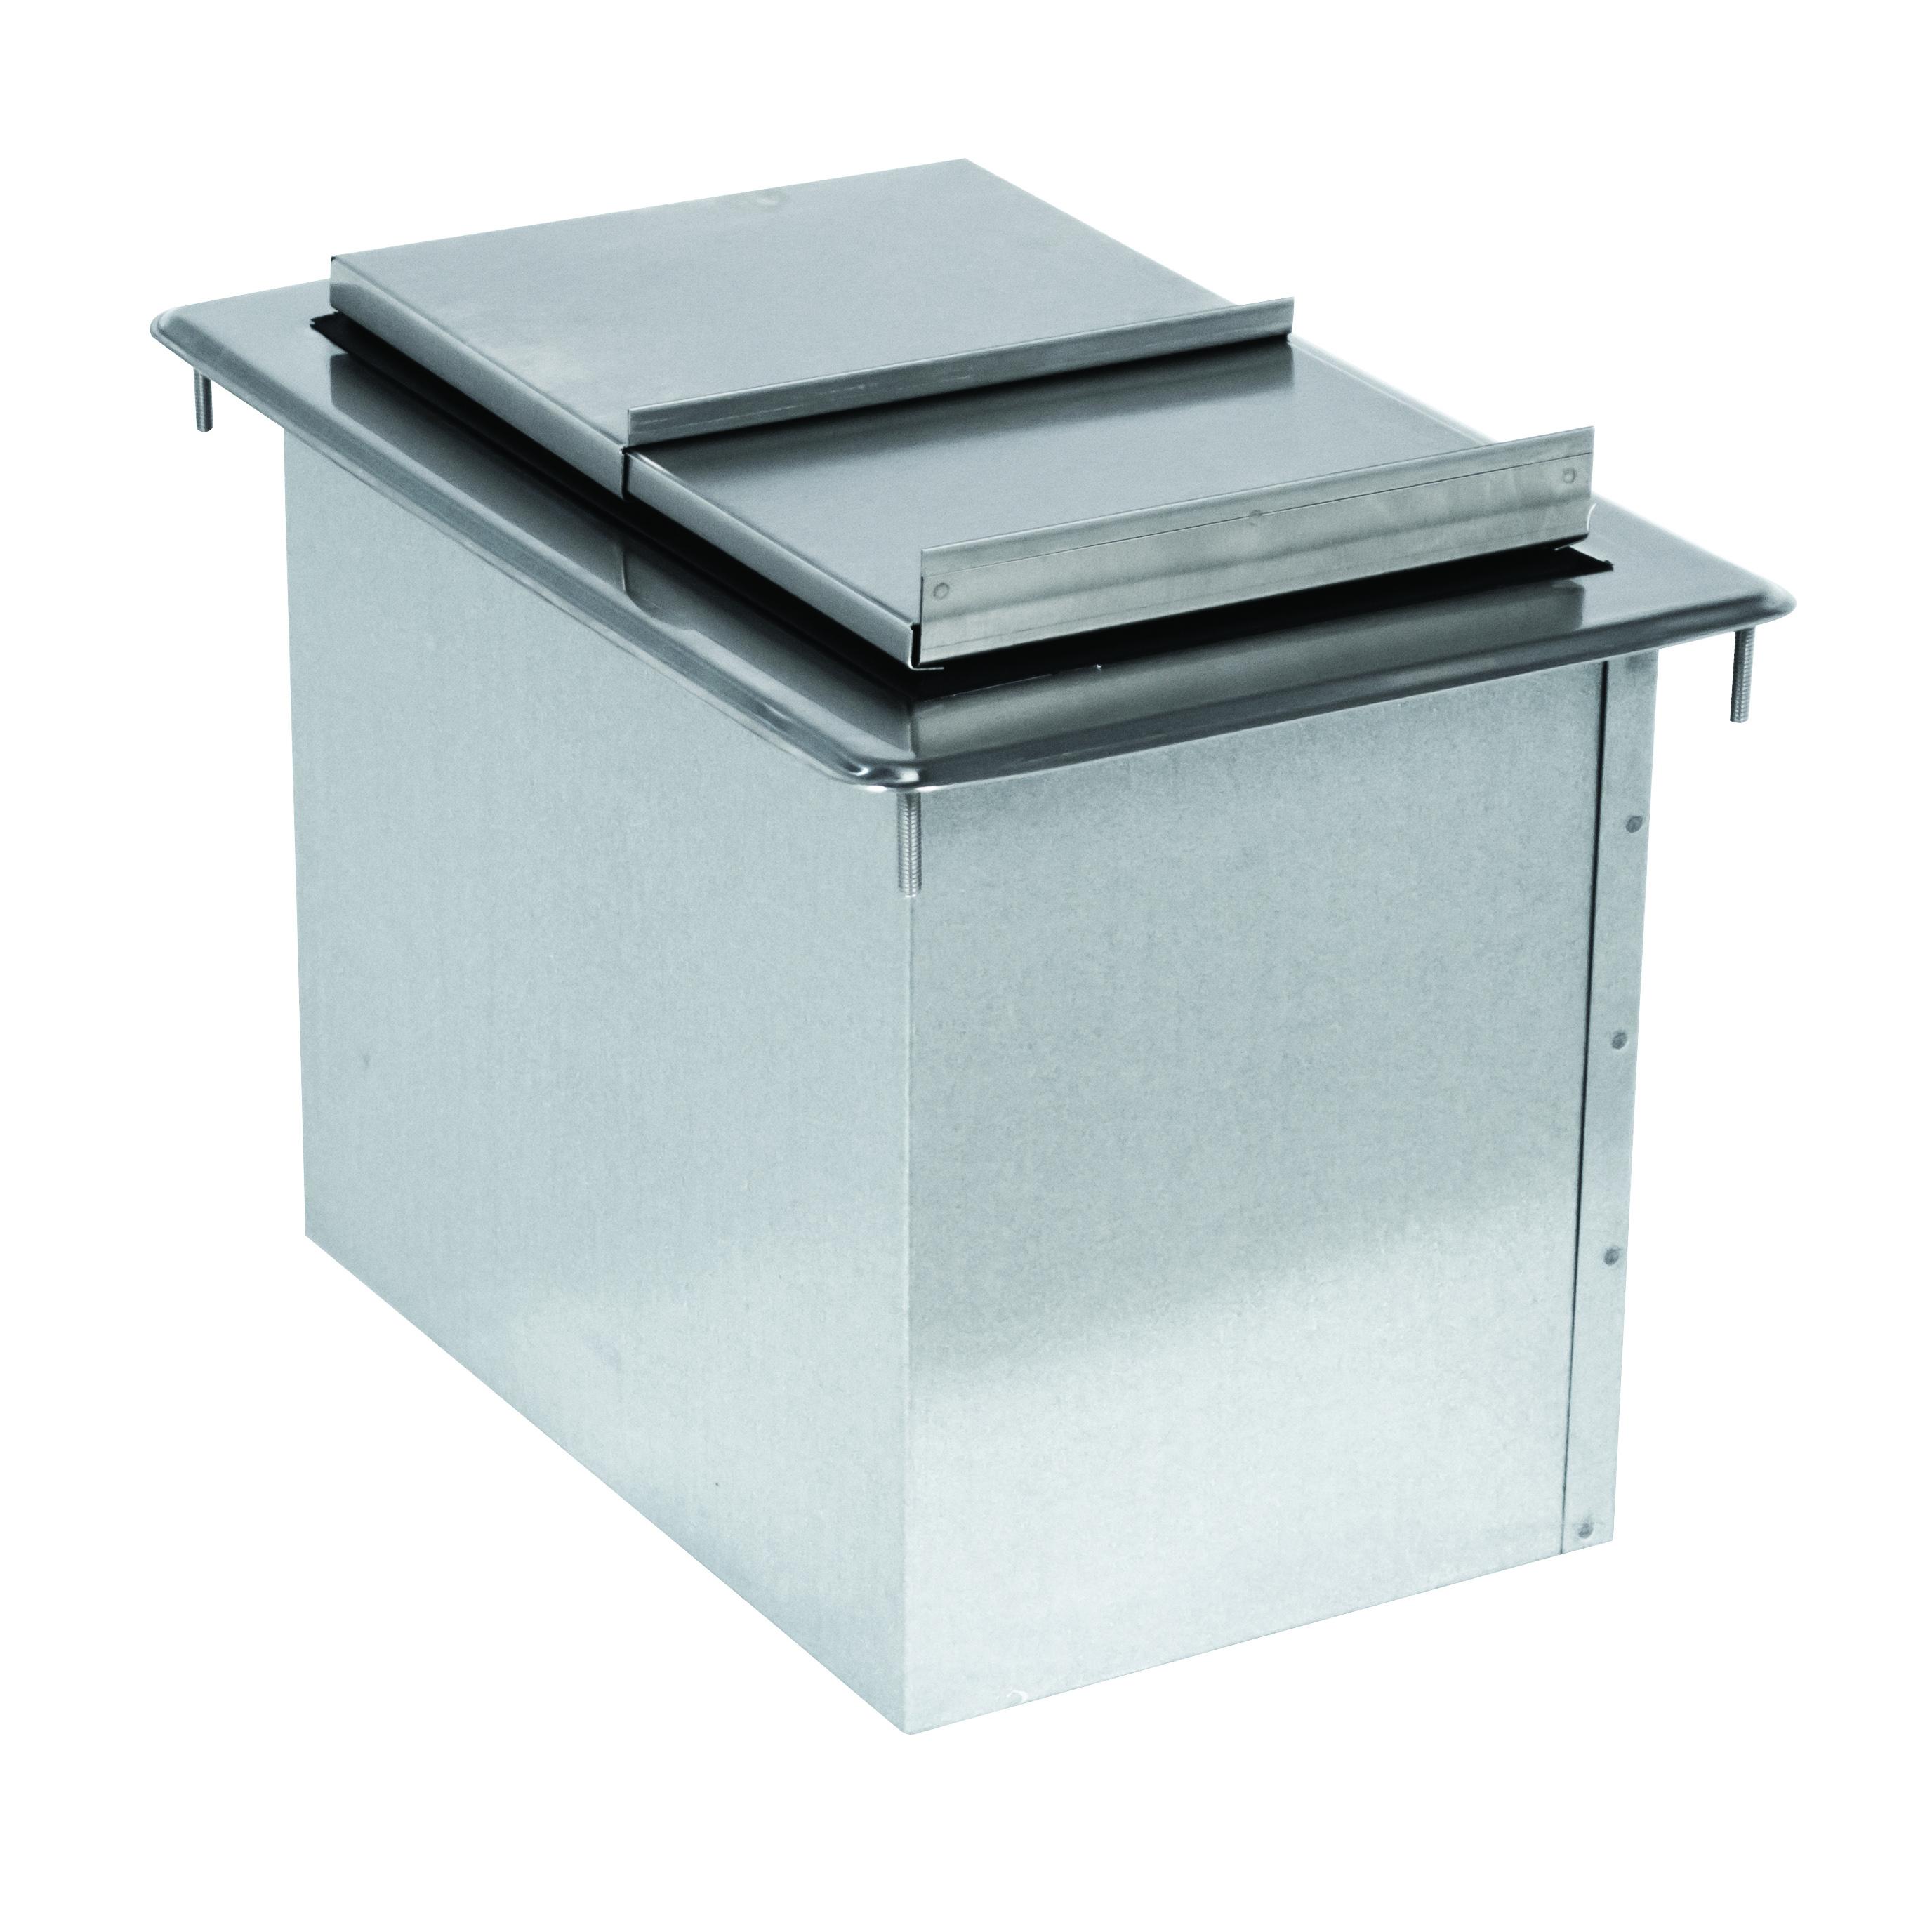 Advance Tabco D-12-IBL-X ice bin, drop-in